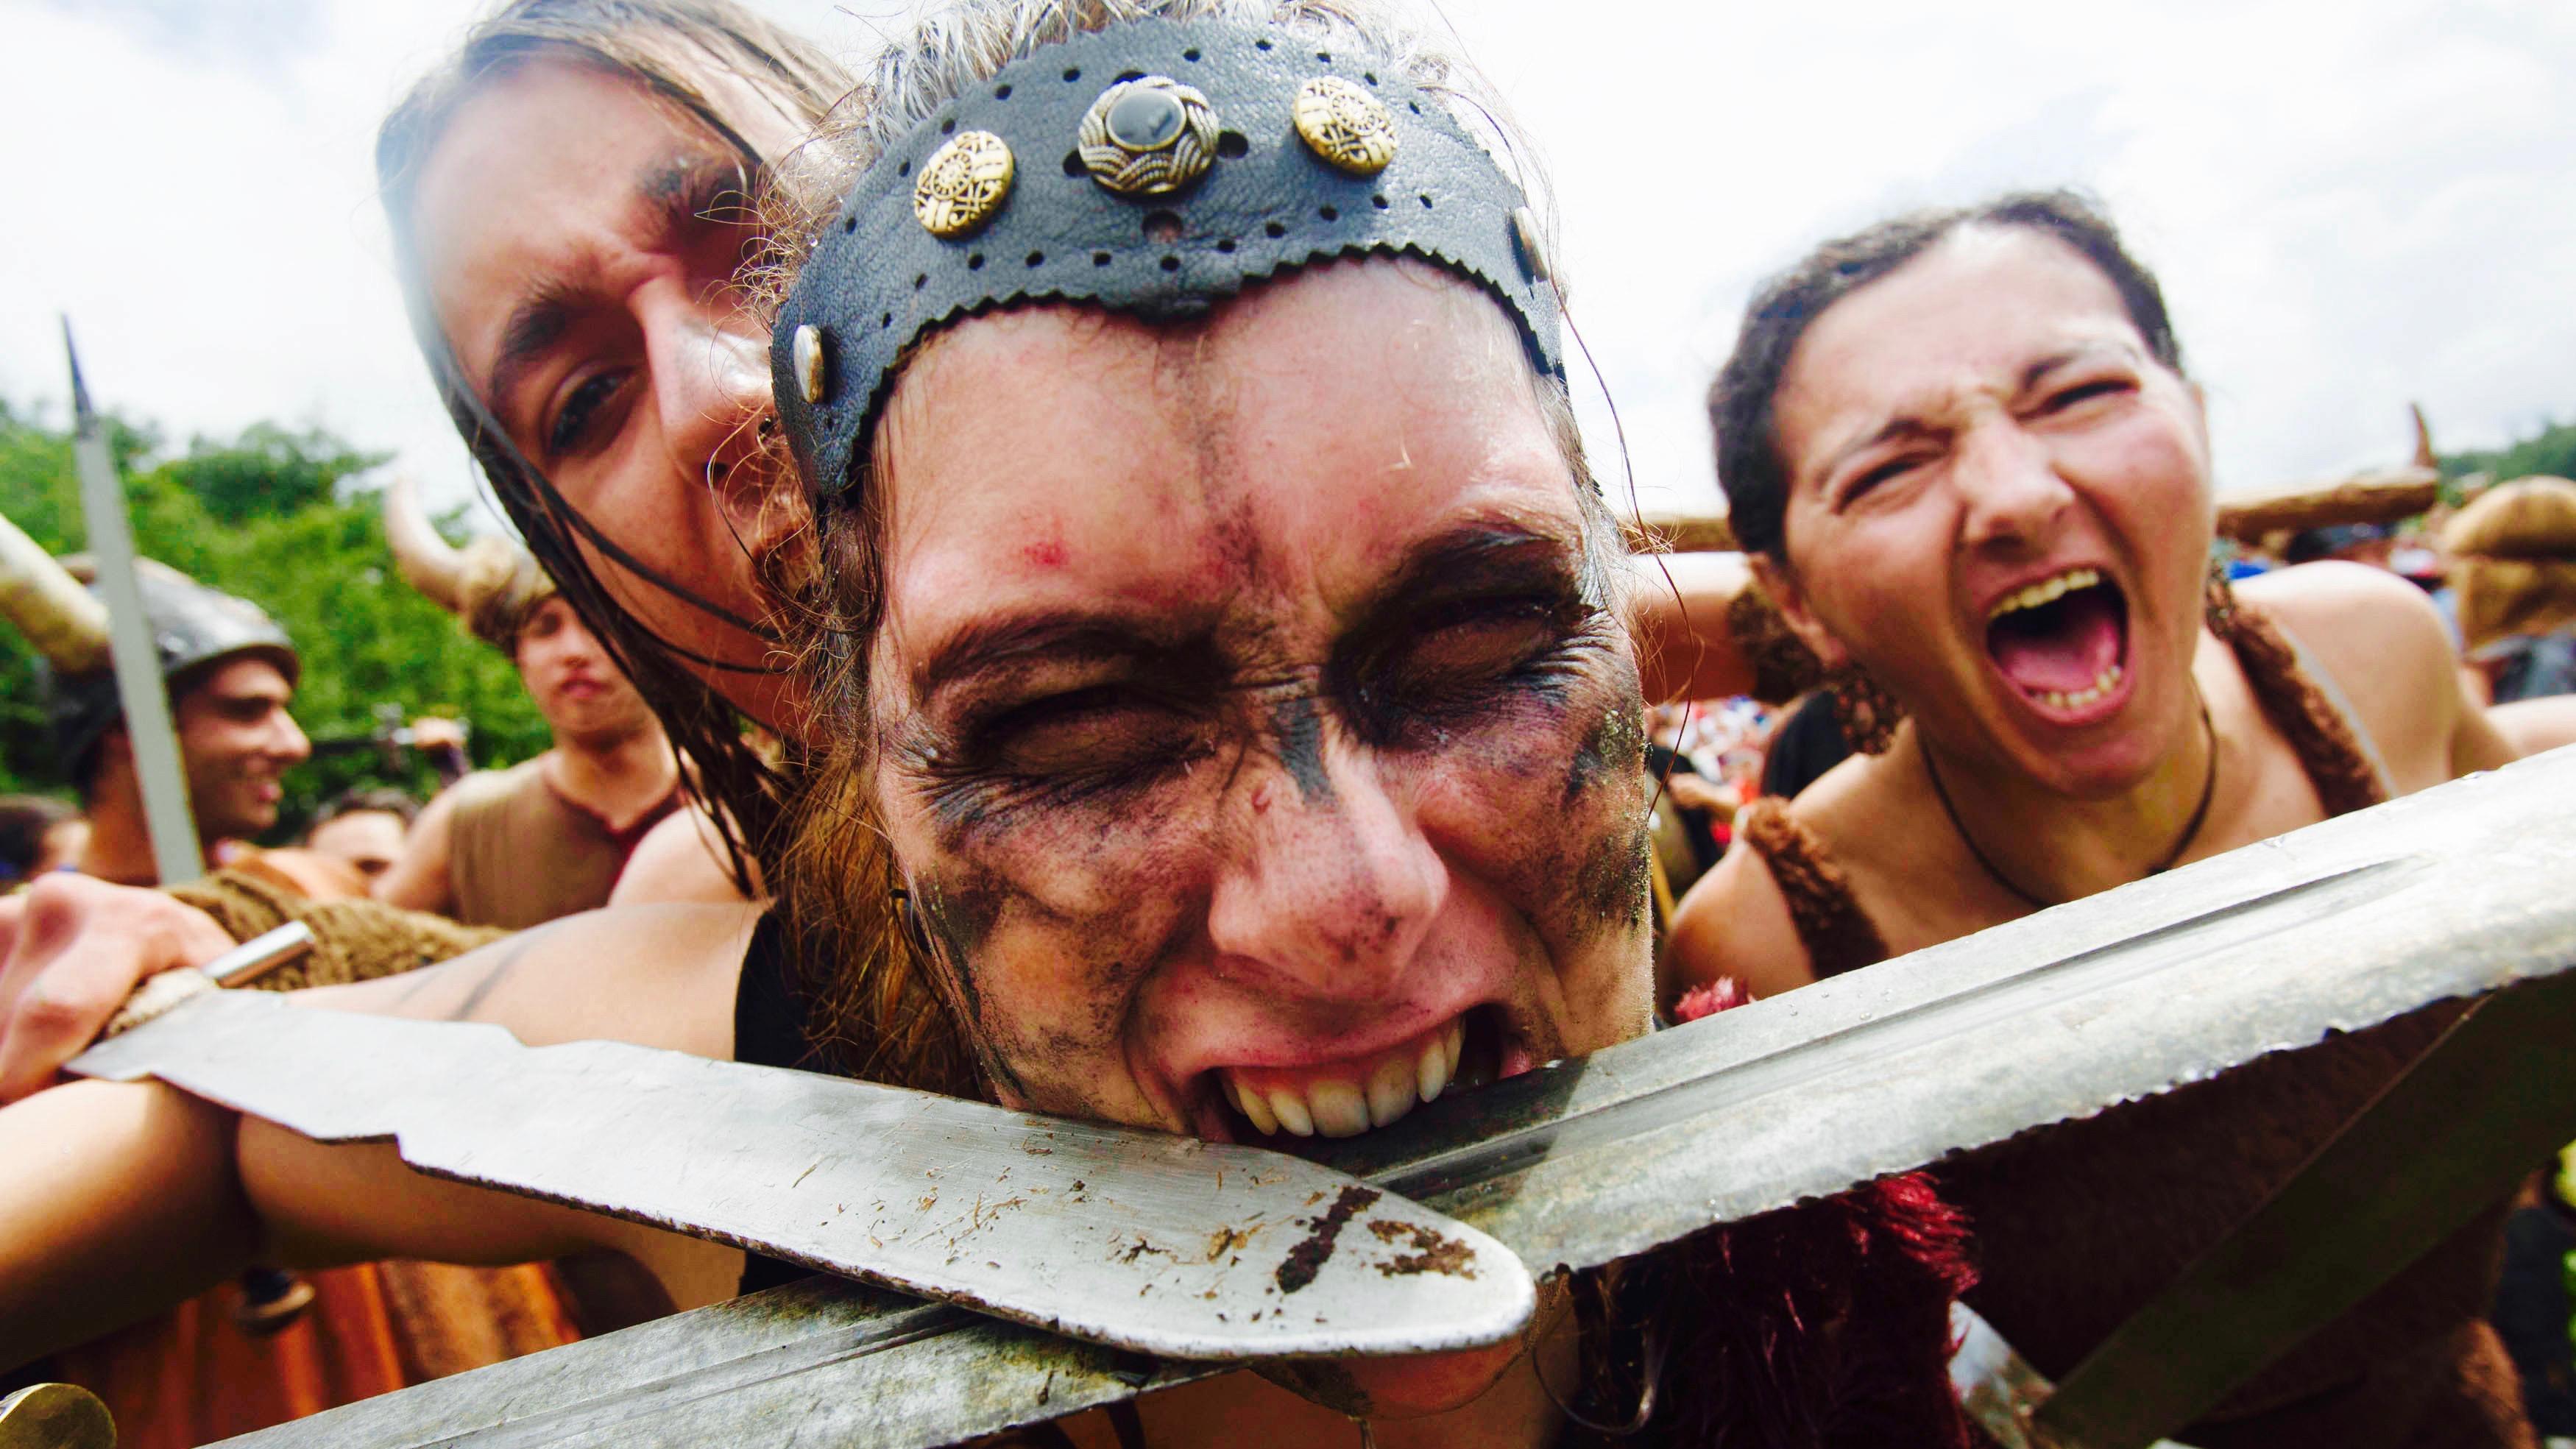 Women dressed as Vikings take part in the annual Viking festival of Catoira in Spain.